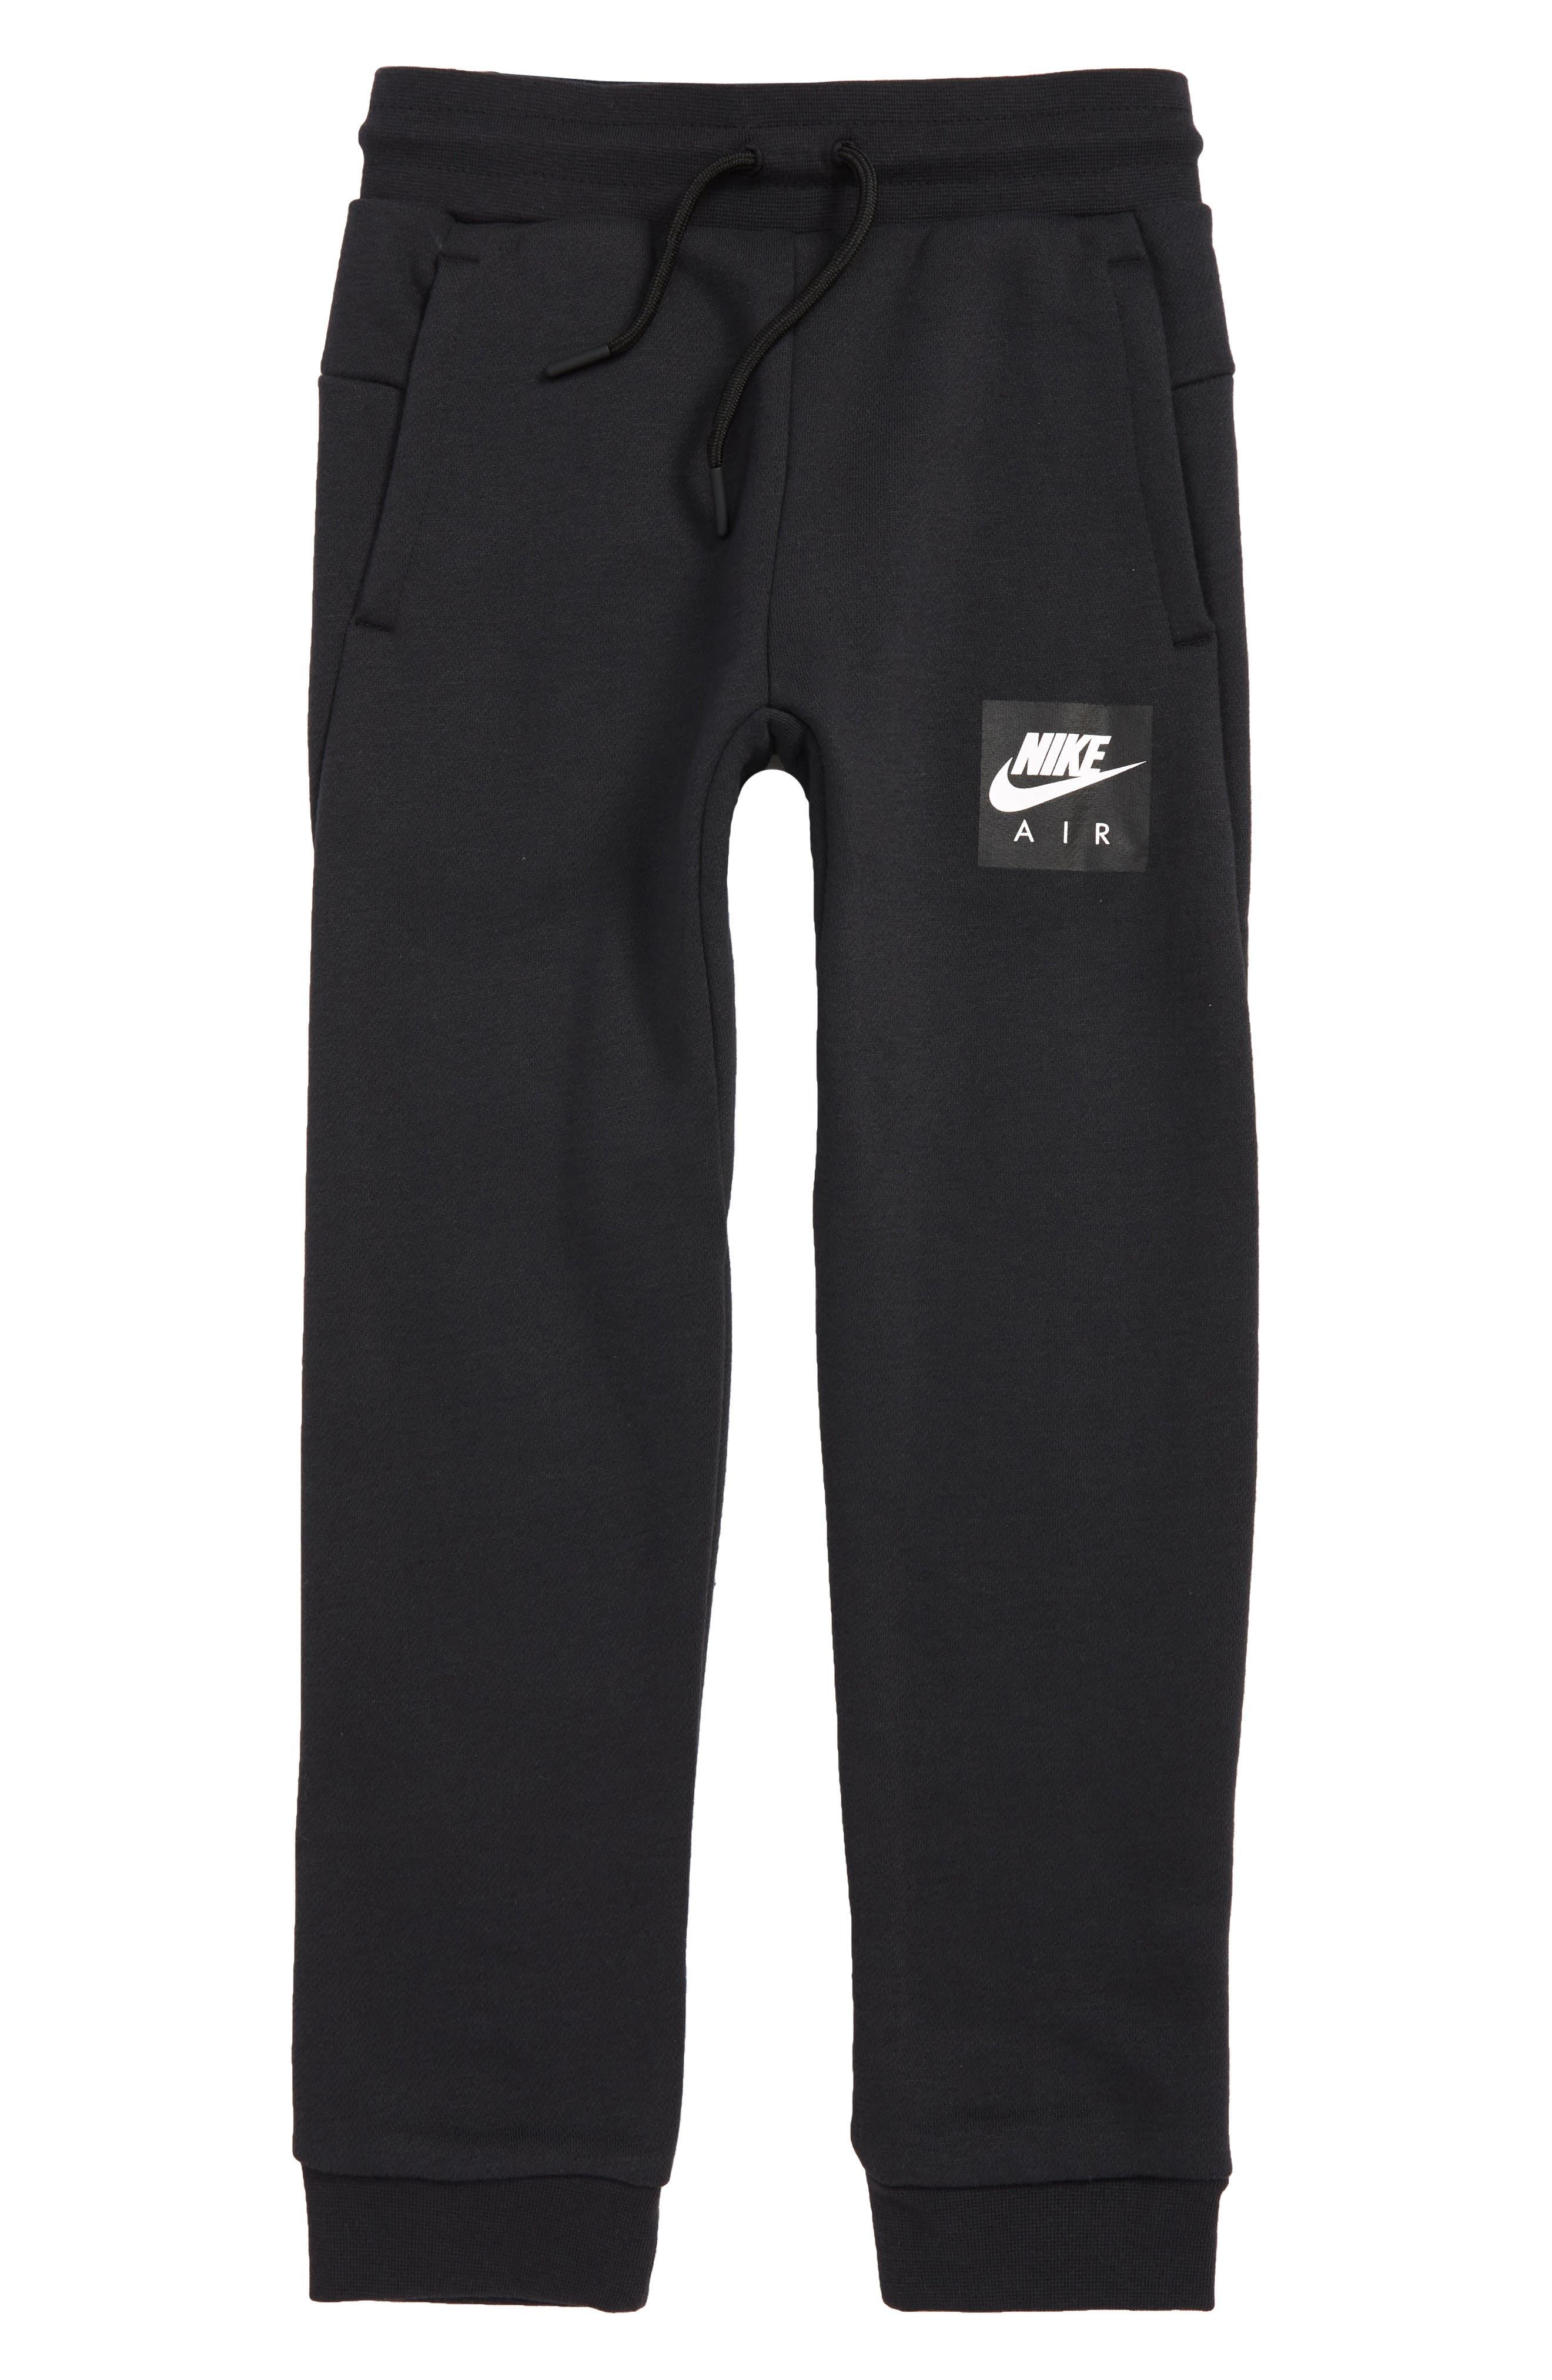 5994e259c6c0 boys nike pants